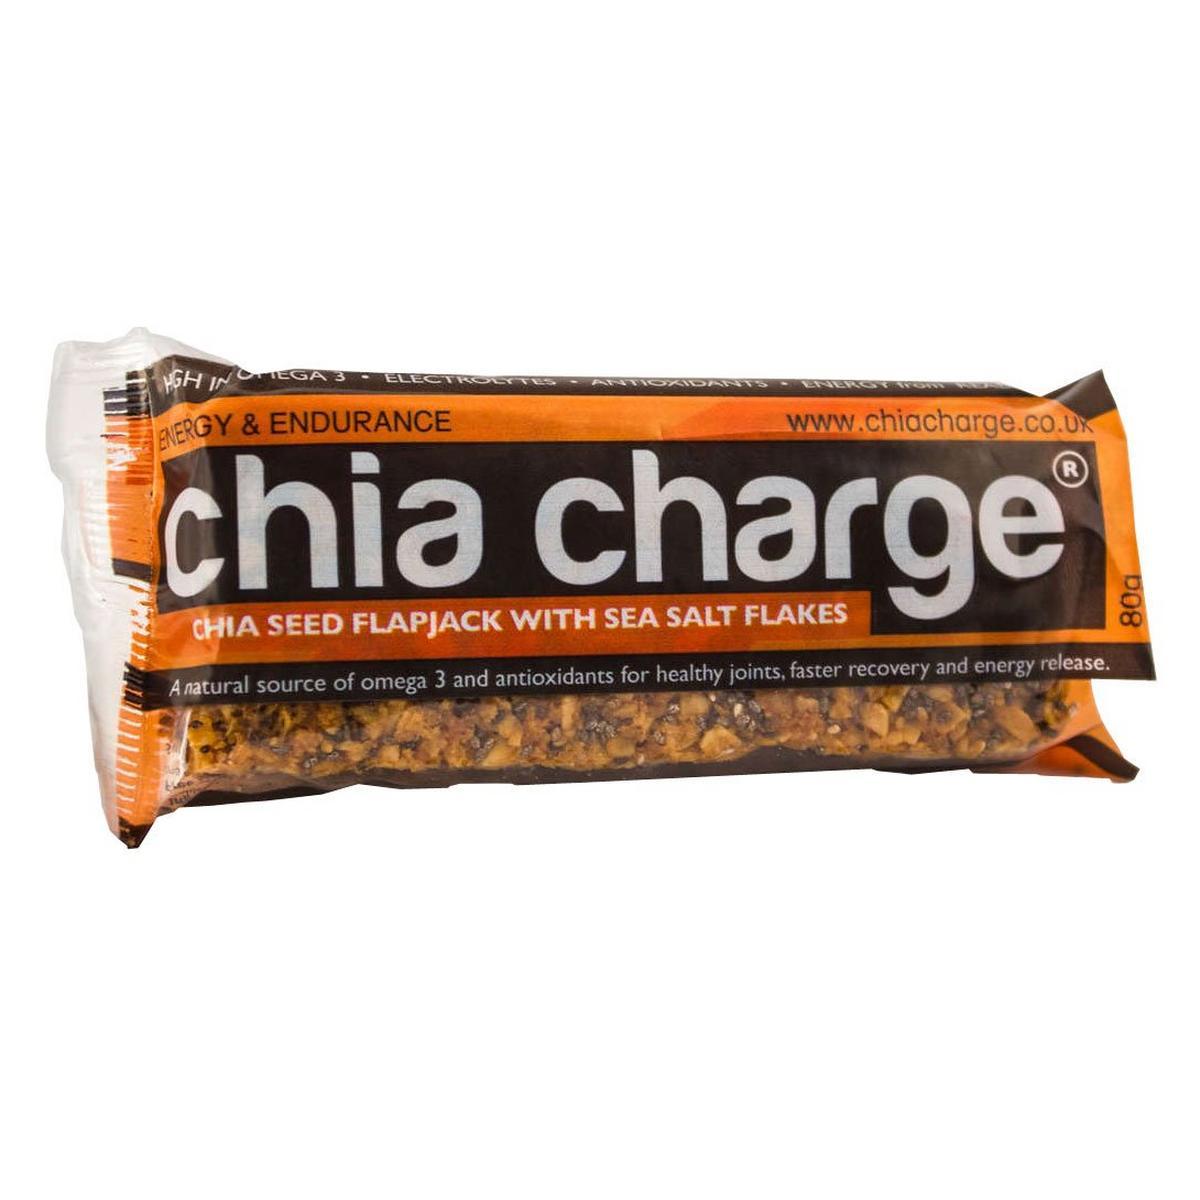 Chia Charge Chia Seed Flapjack with Sea Salt Flakes